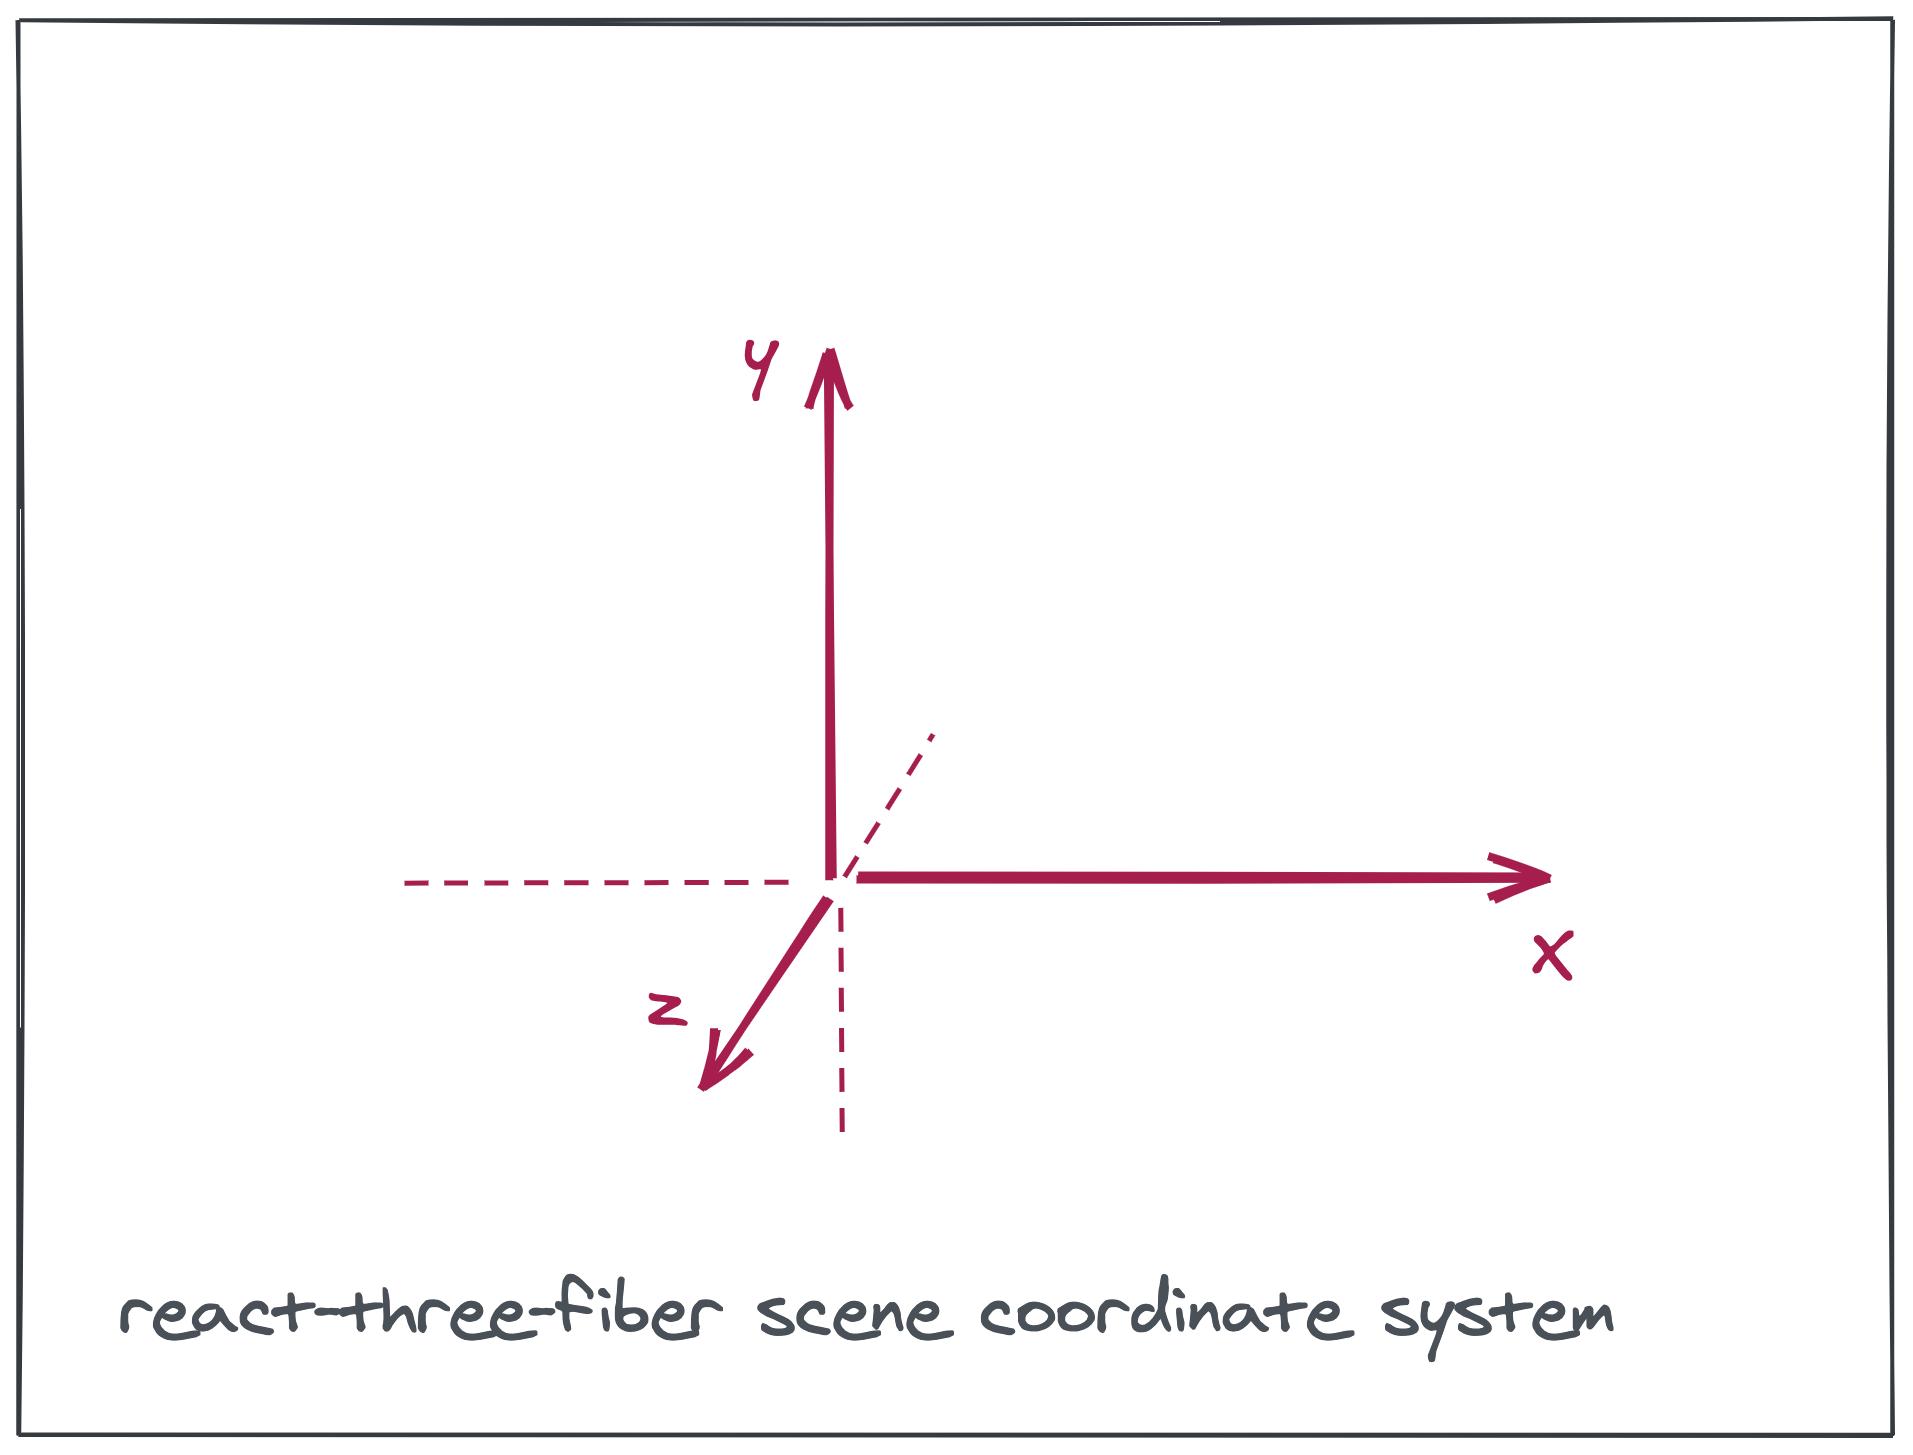 react-three-fiber scene coordinate system